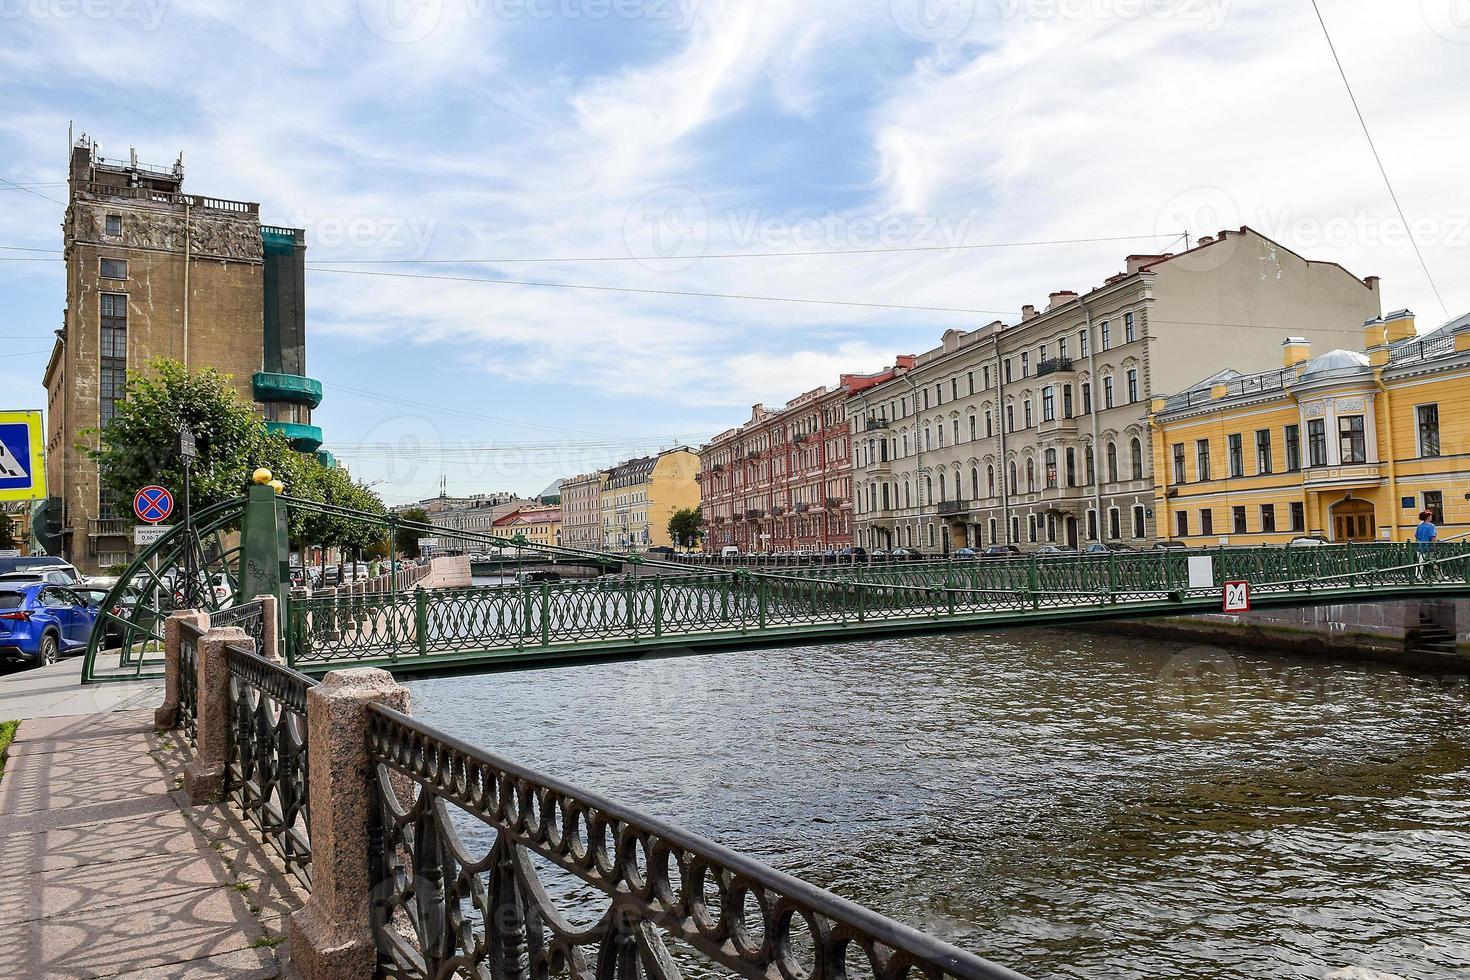 Pochtamtsky bridge in Leningrad, USSR photo